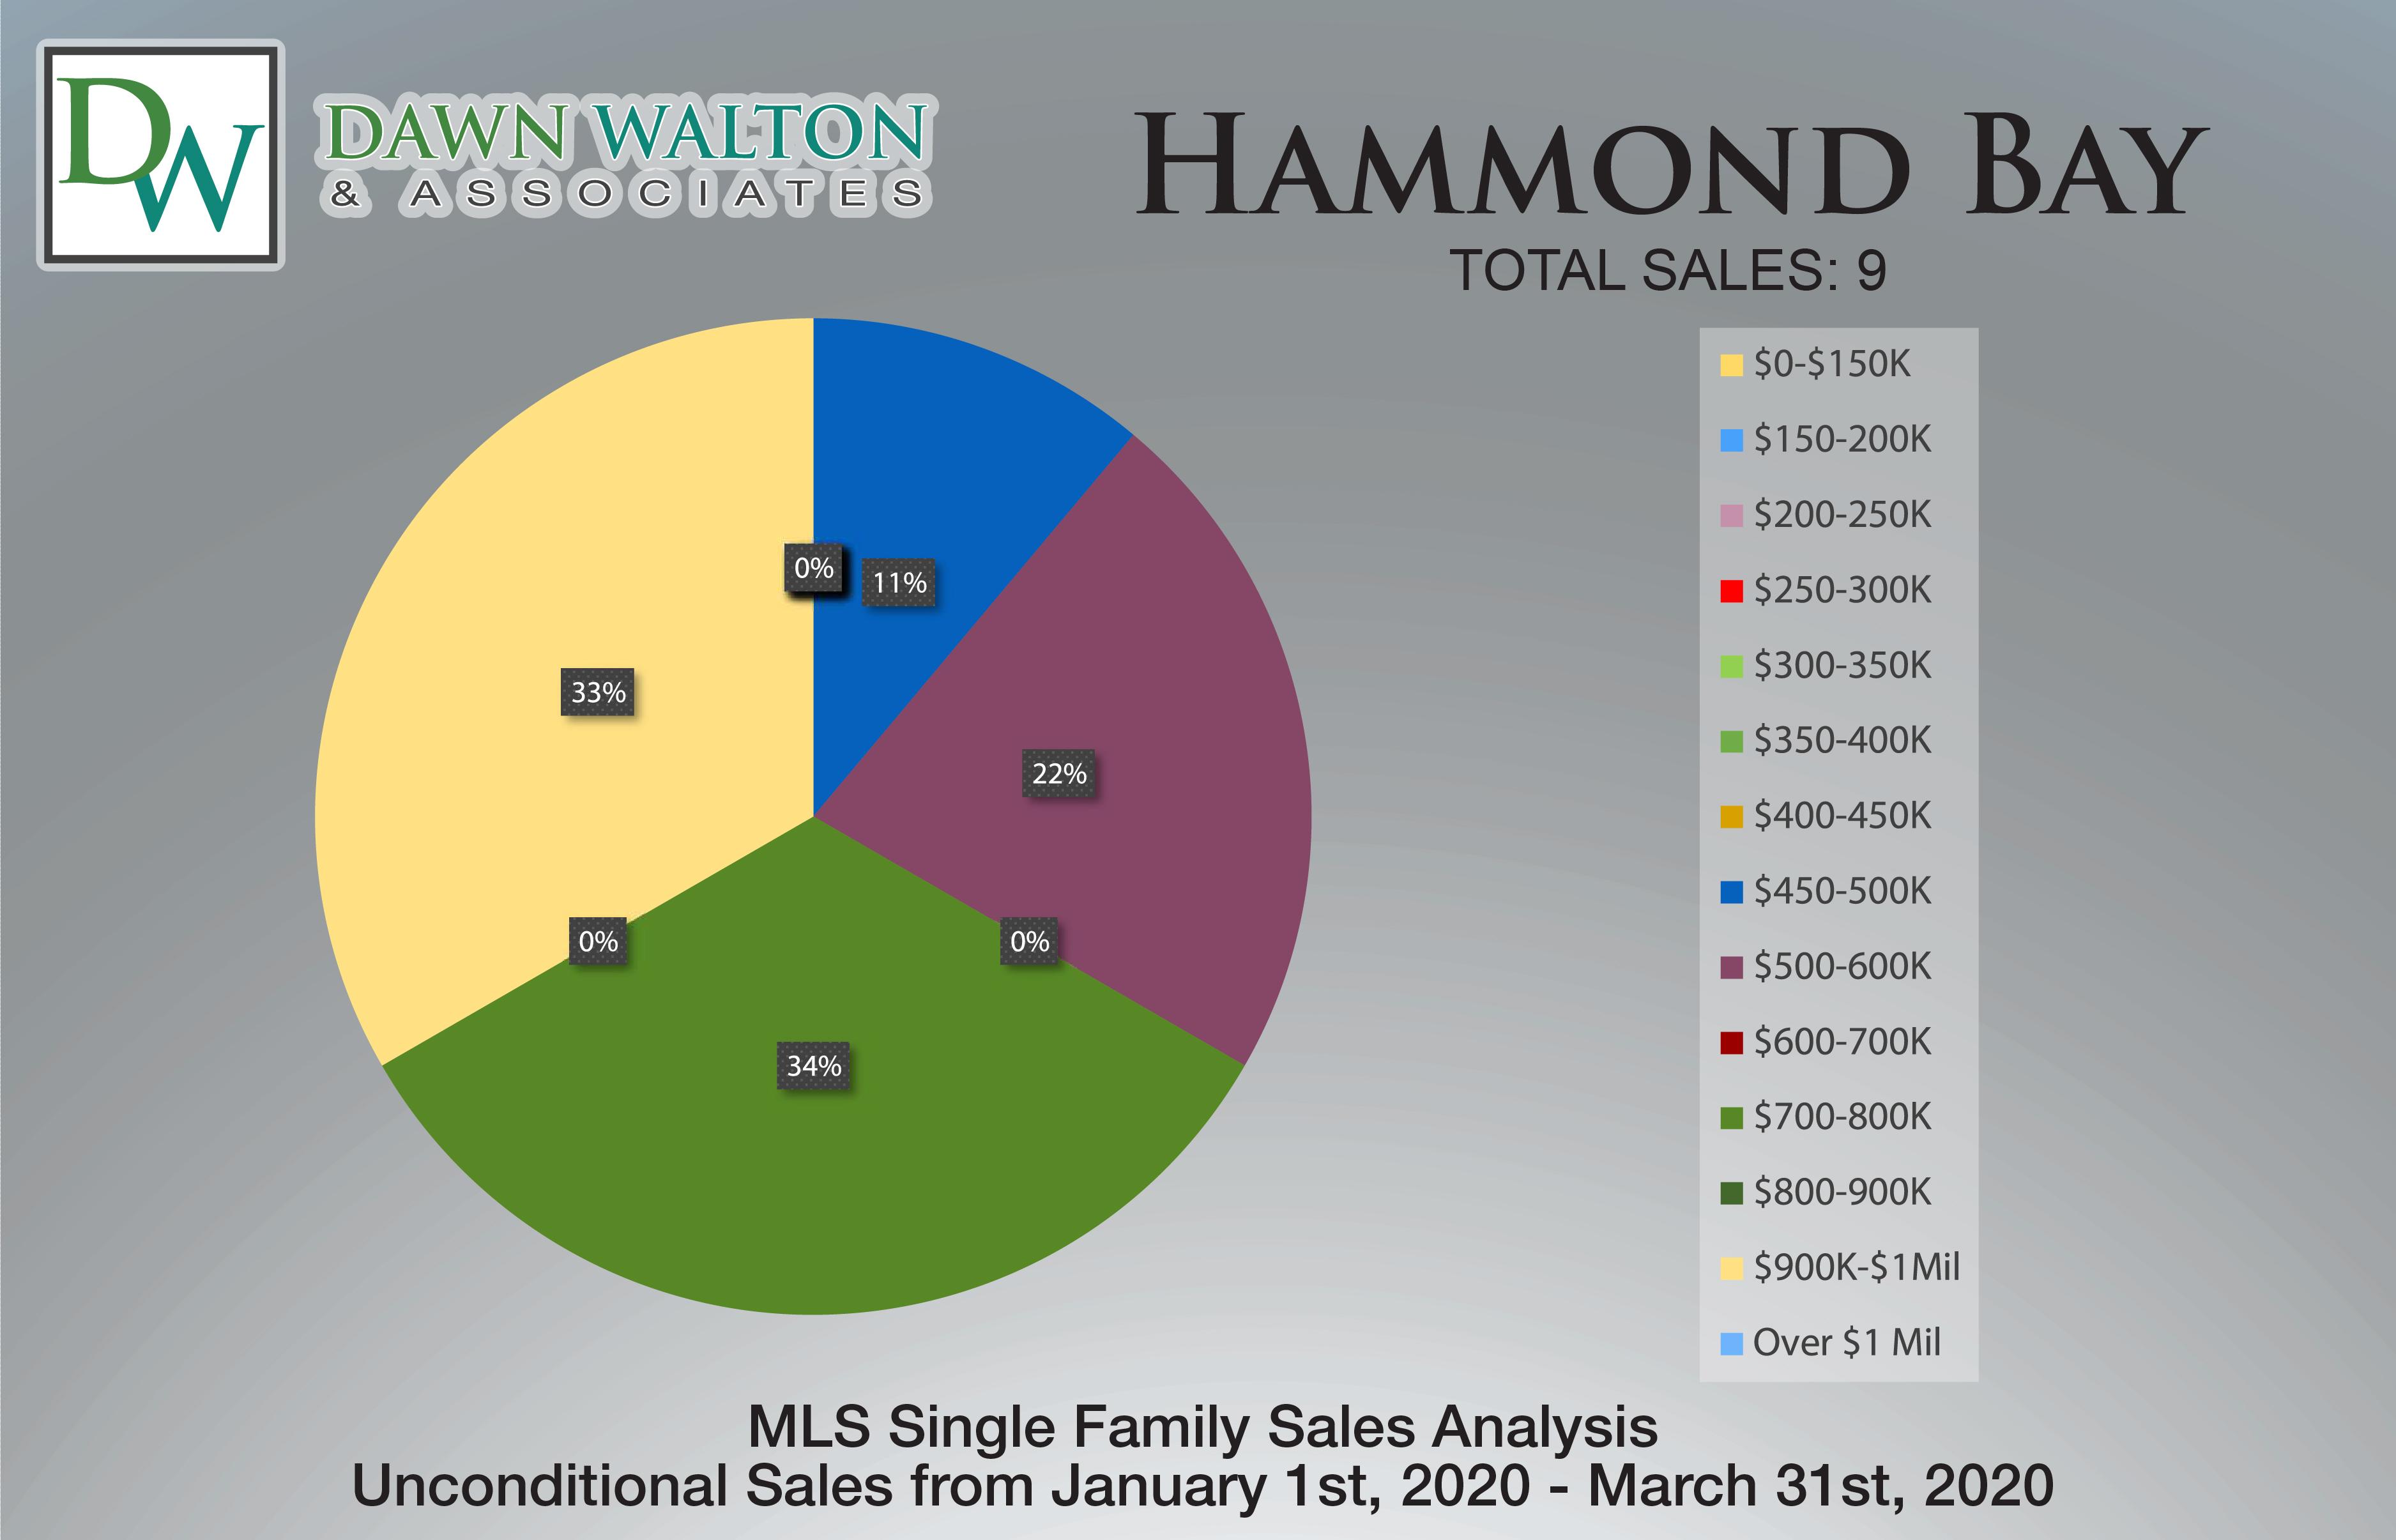 Hammond Bay Real Estate Market Stats Price Percentage Jan 1-Mar 31 2020 - Nanaimo Realtor Dawn Walton